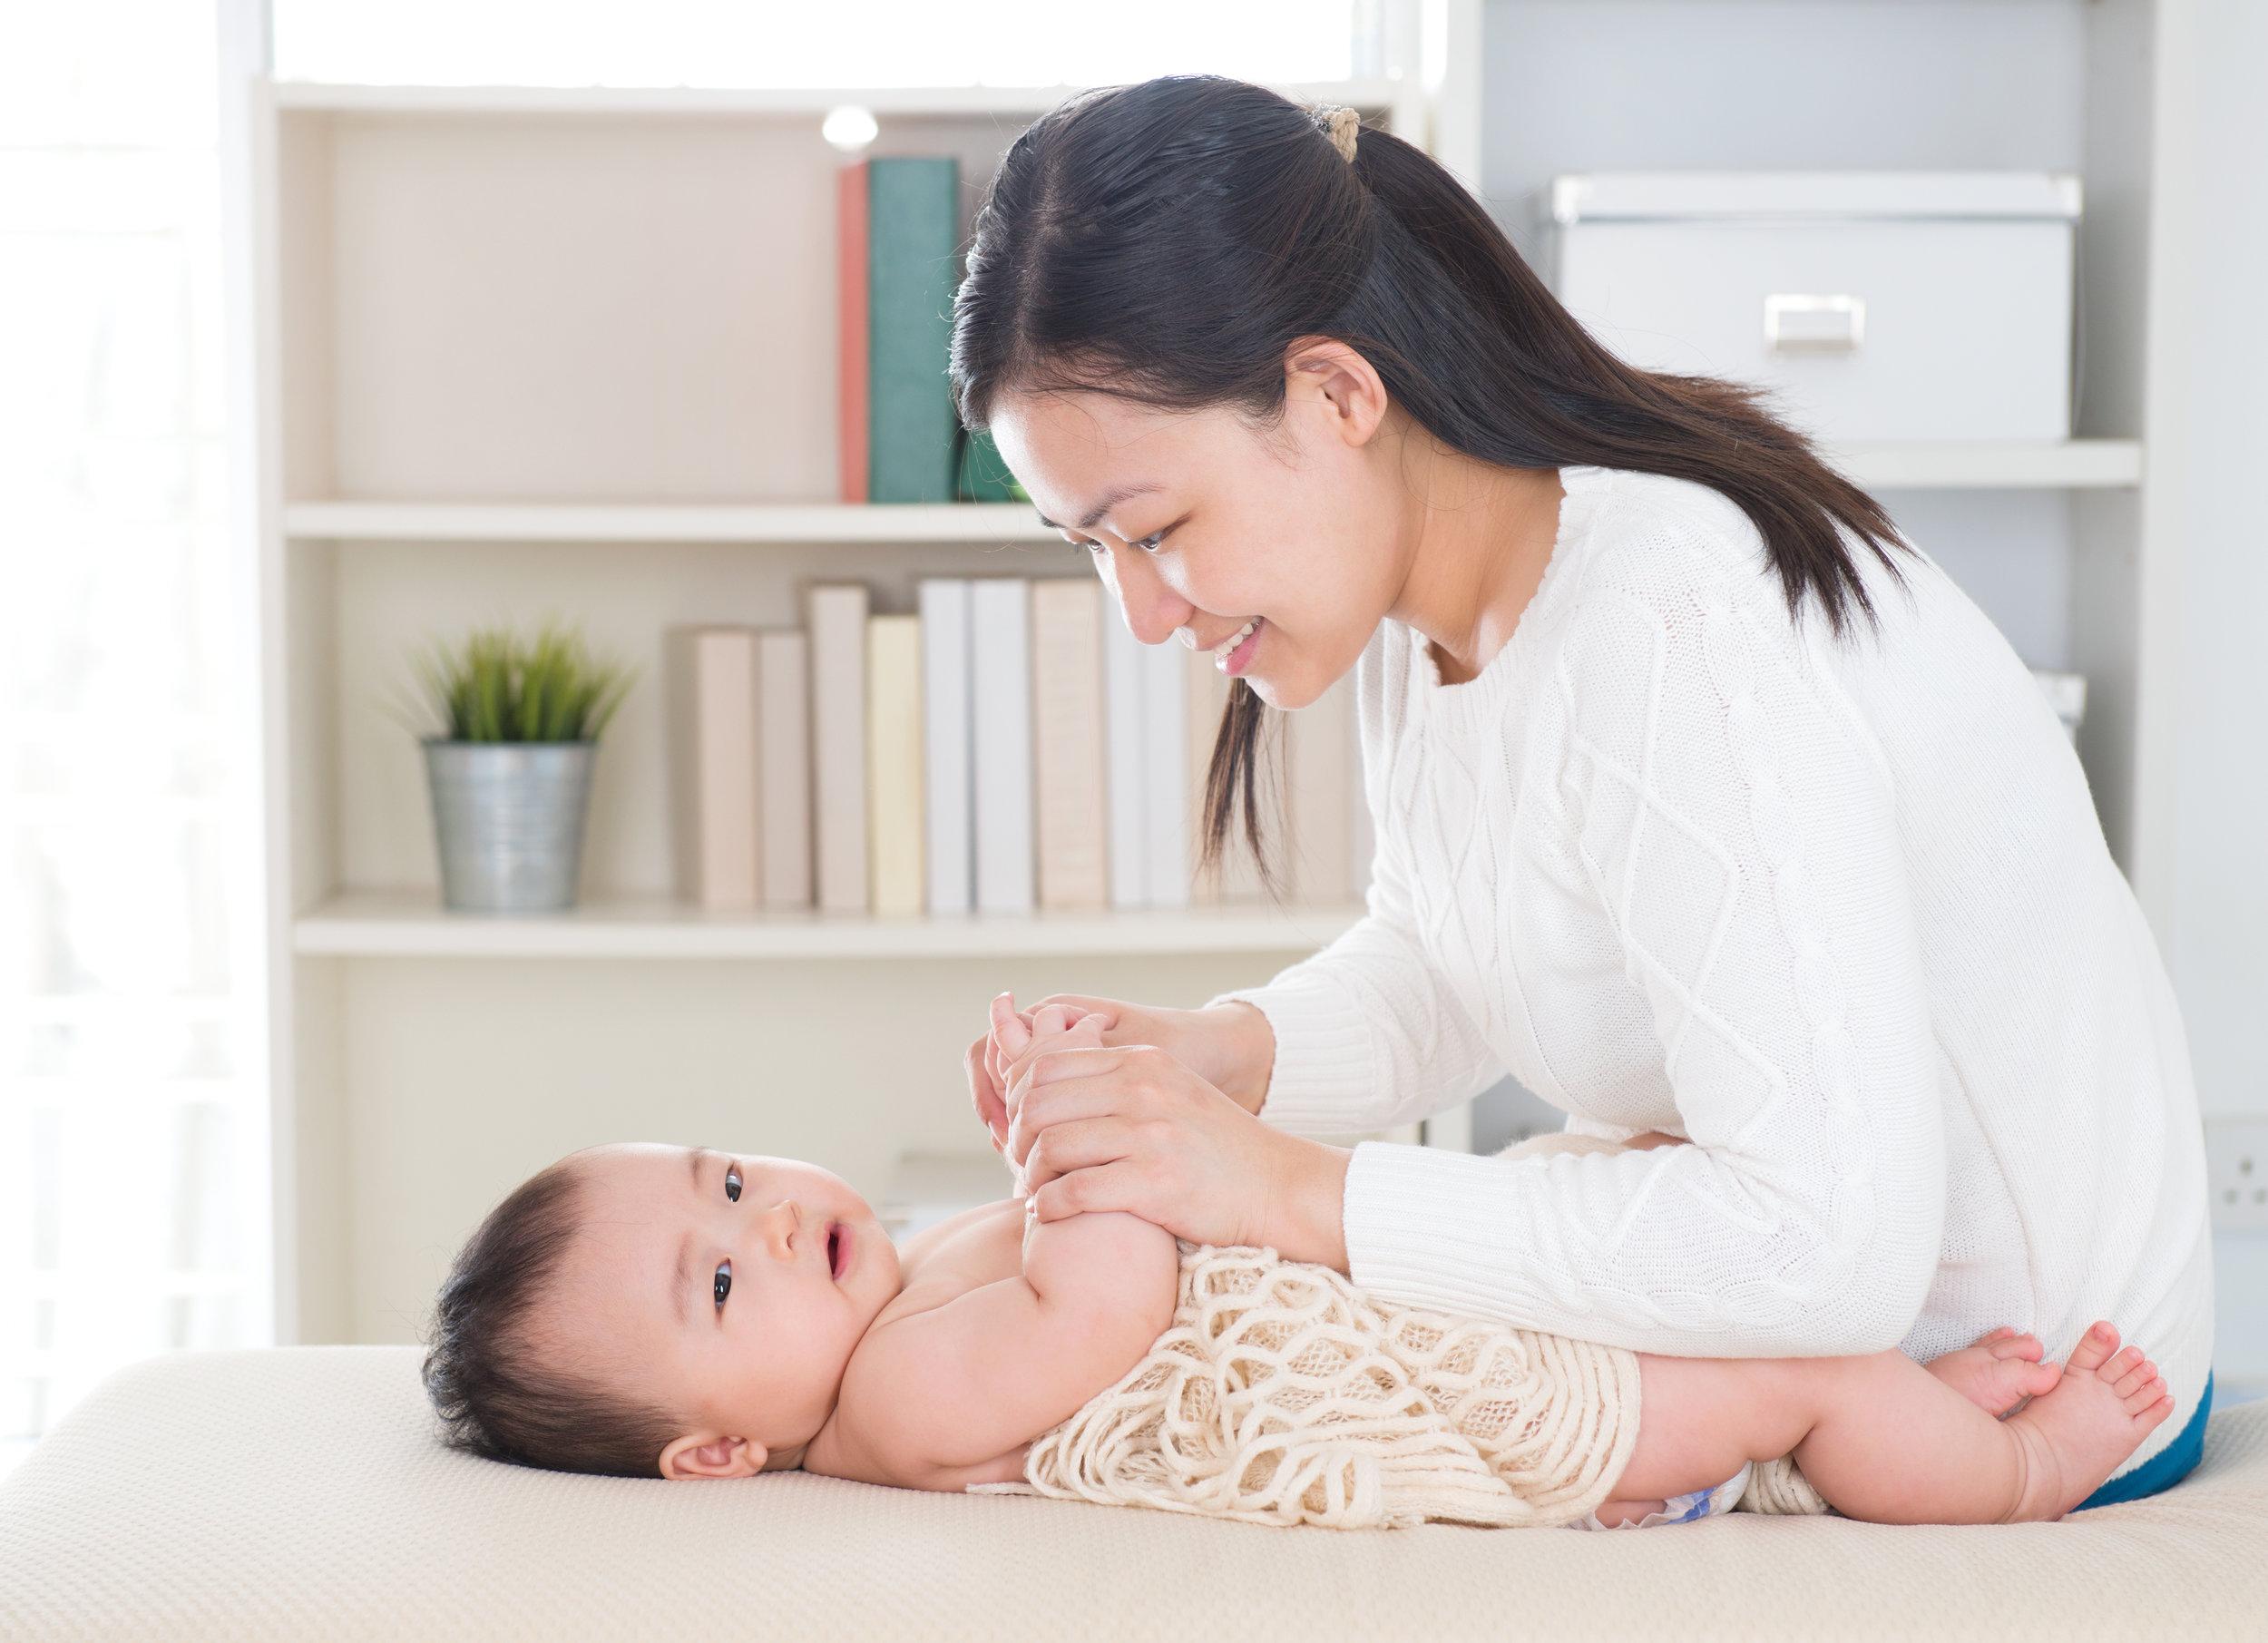 storyblocks-baby-massage-asian-mother-massaging-baby-hands-at-home_rLHnxVZeaz.jpg